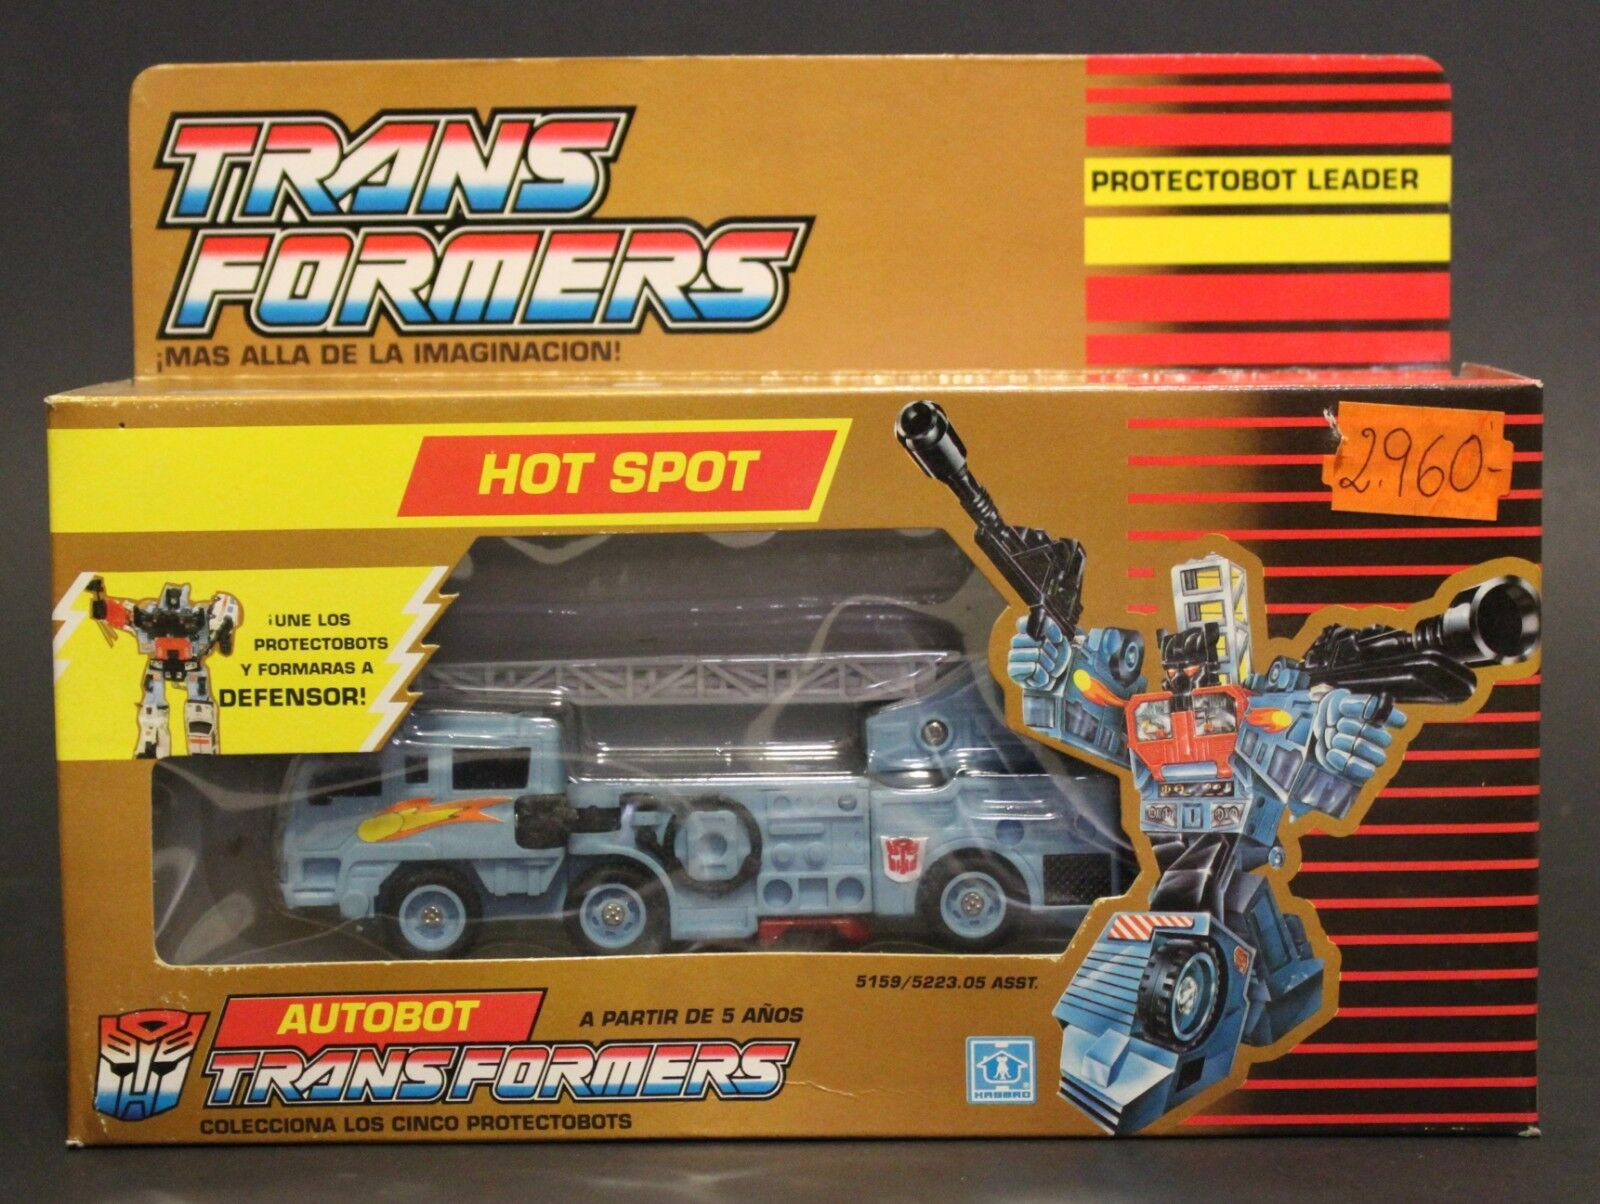 1990 g1 transformers protectobot hot spot in euro classic versiegelt Goldene box vhtf